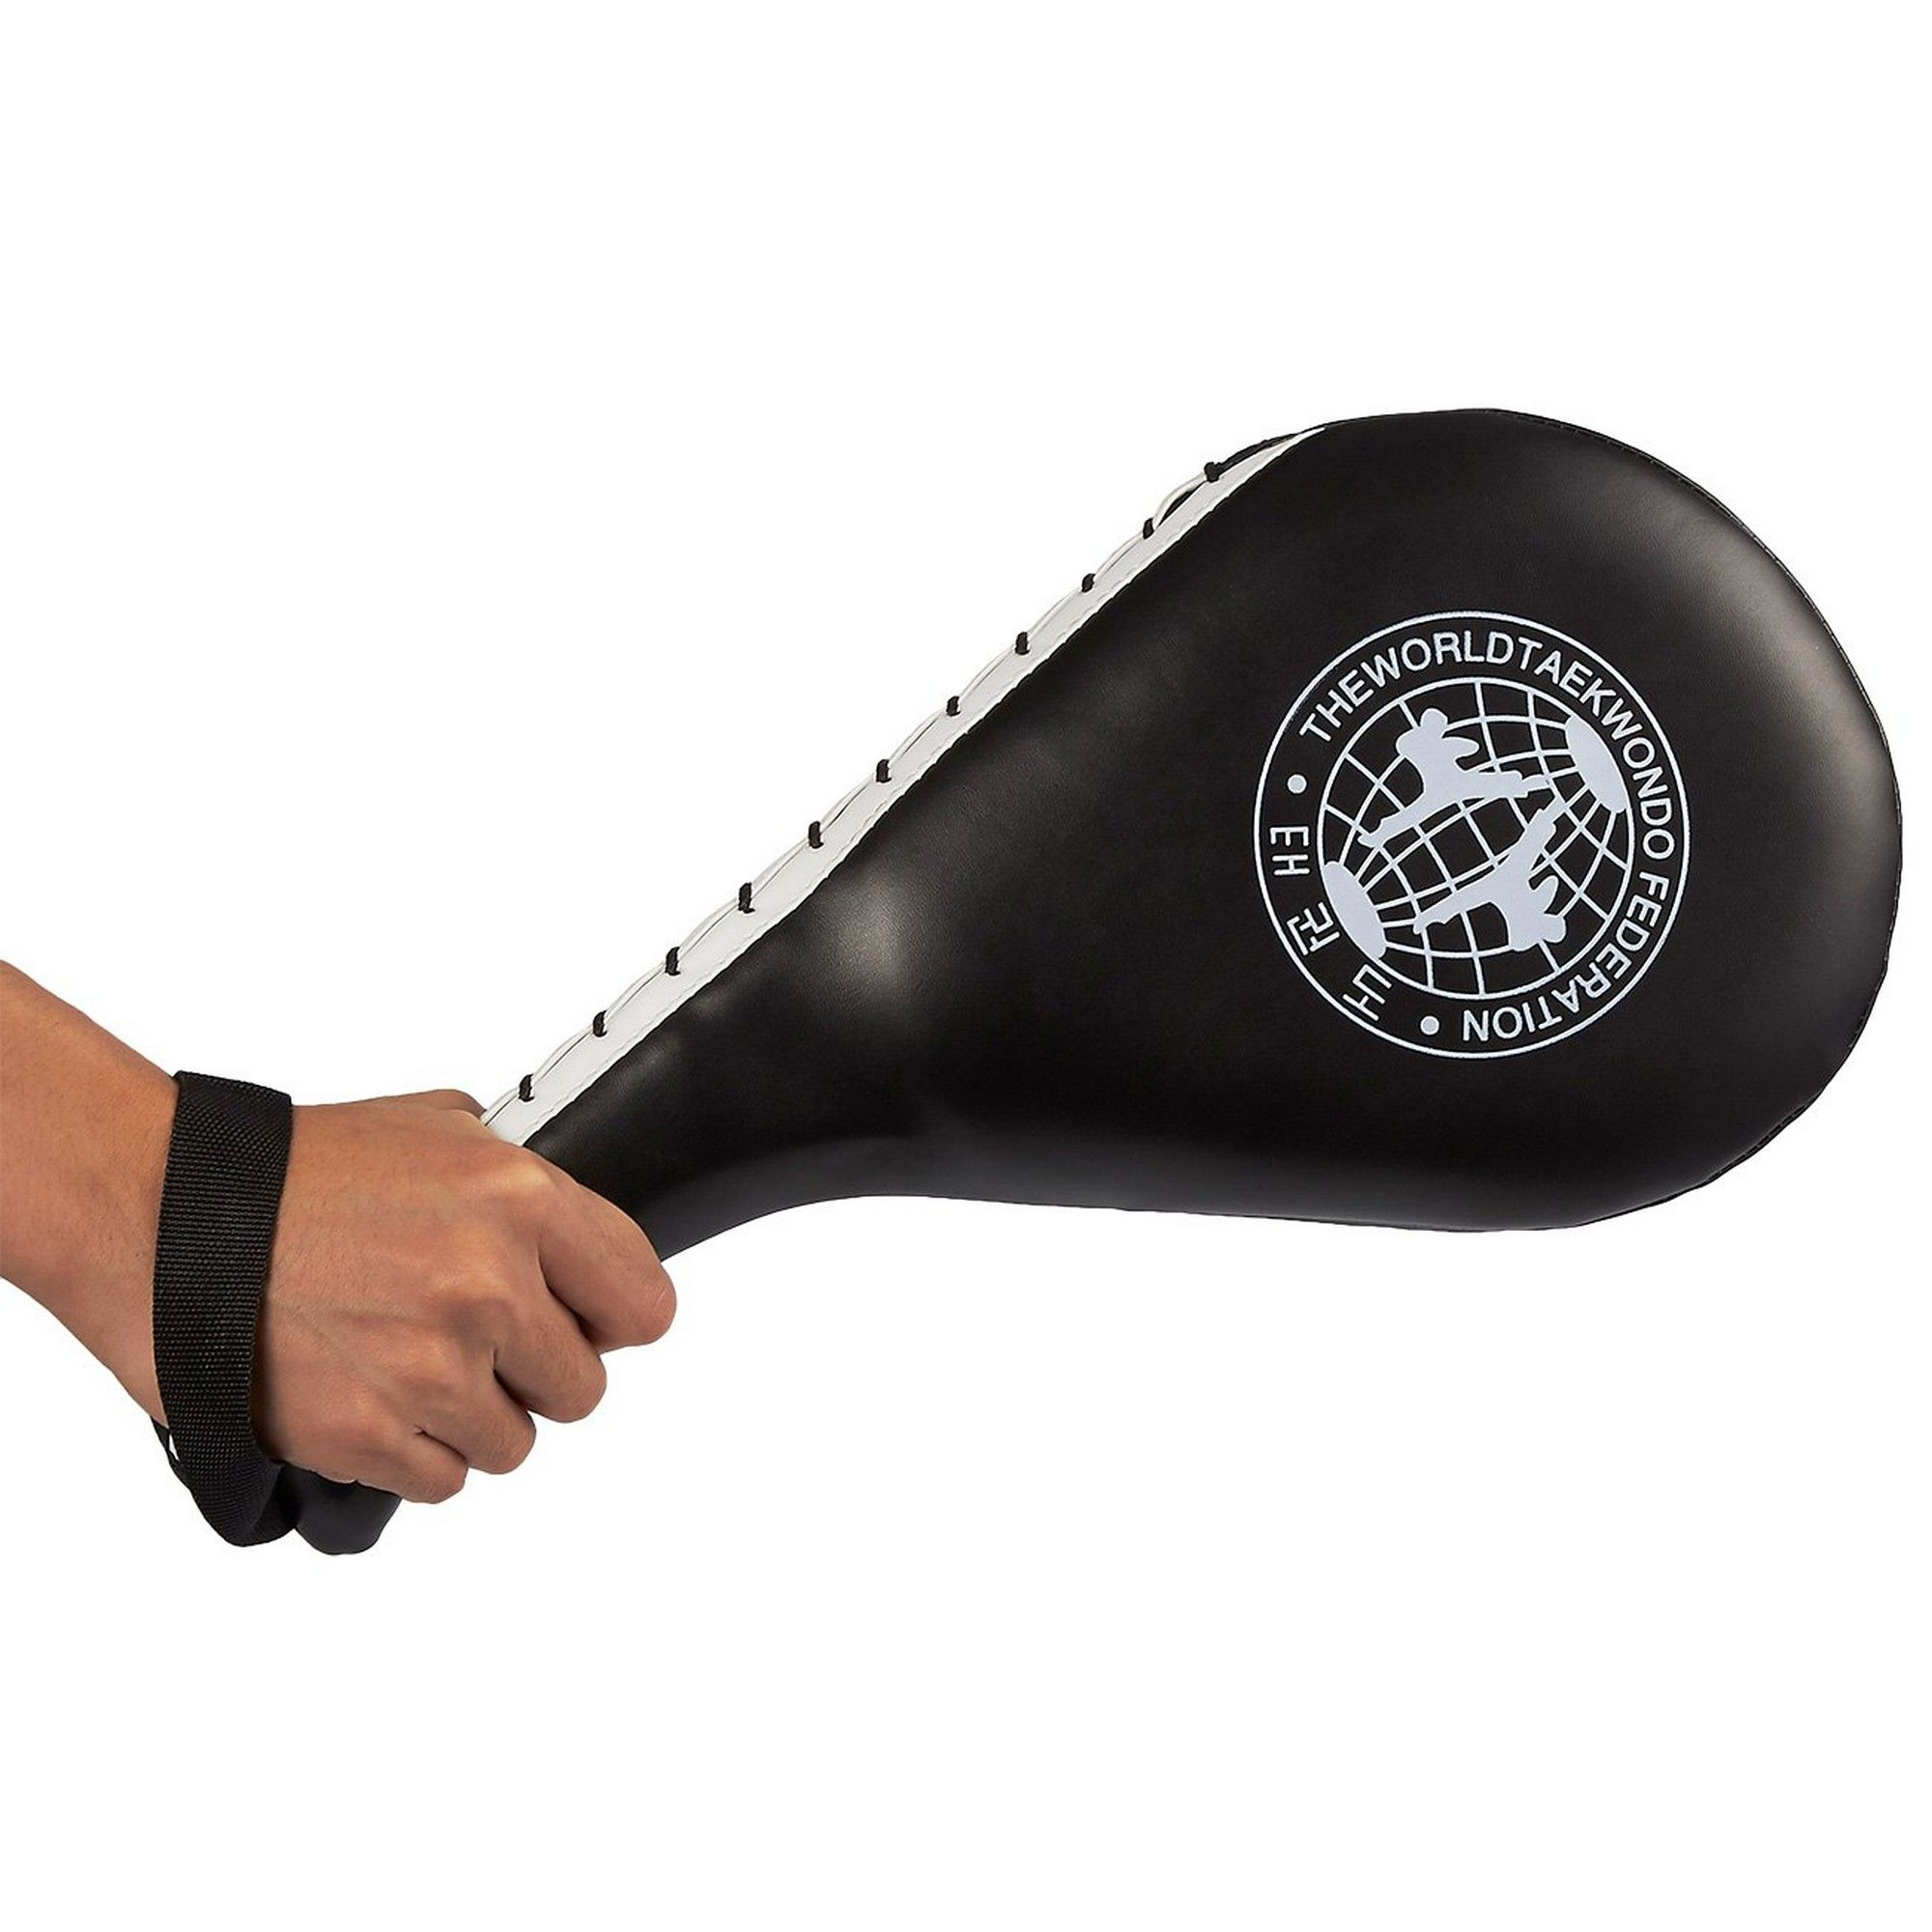 Black 15 x 2.5 x 7.5 Inches Double Kick Durable Strike Pads for Kickboxing Training Combat Sports Karate Kicking Target Pack of 2 Taekwondo Kick Pads